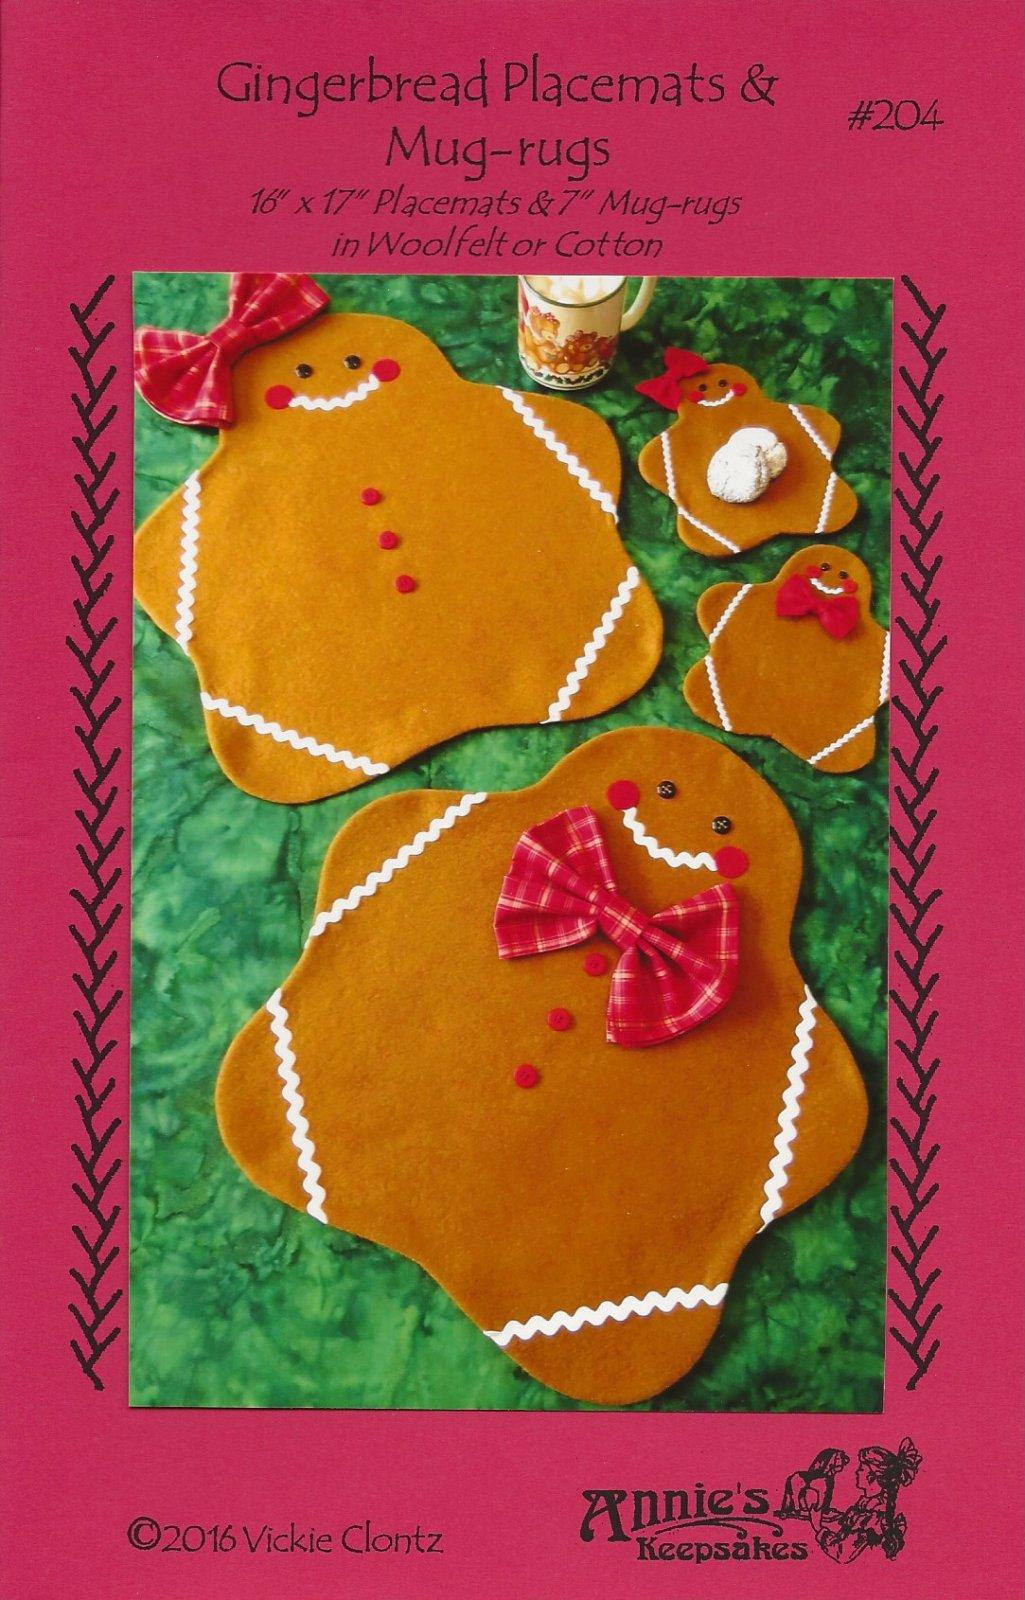 Gingerbread Placemats & Mug-rugs